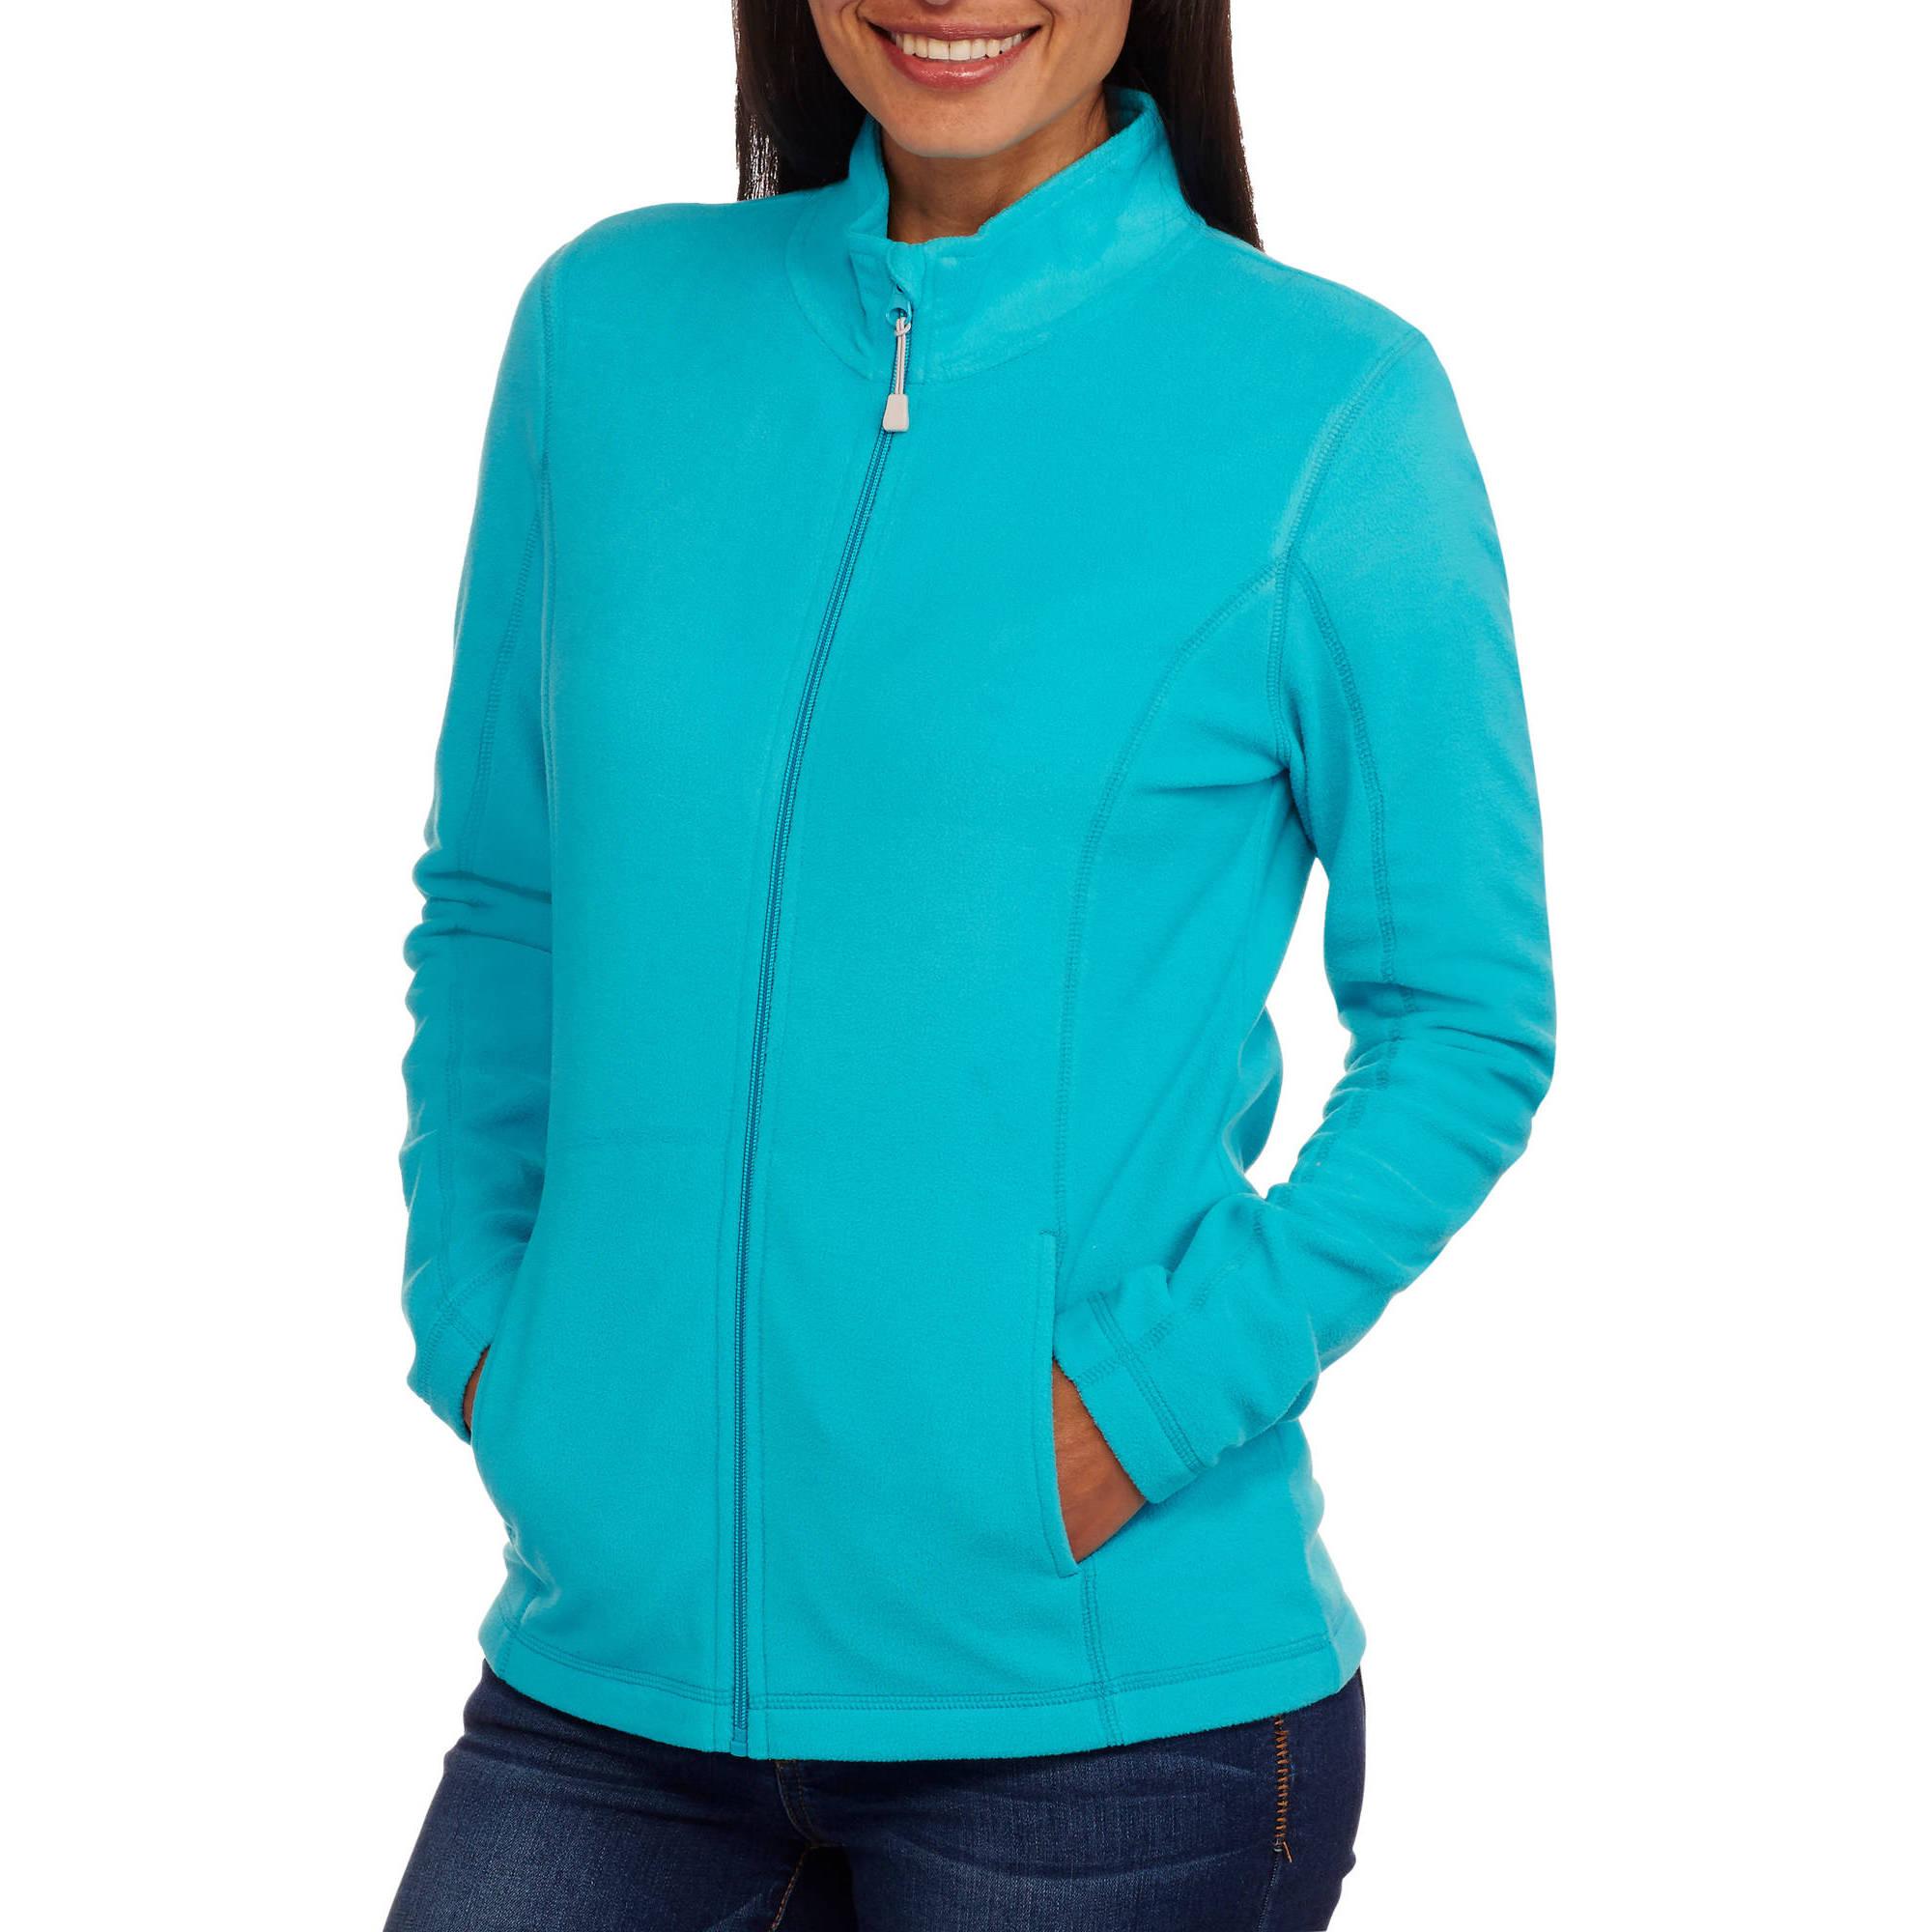 Athletic Works Women's Mockneck Full Zip Microfleece Jacket